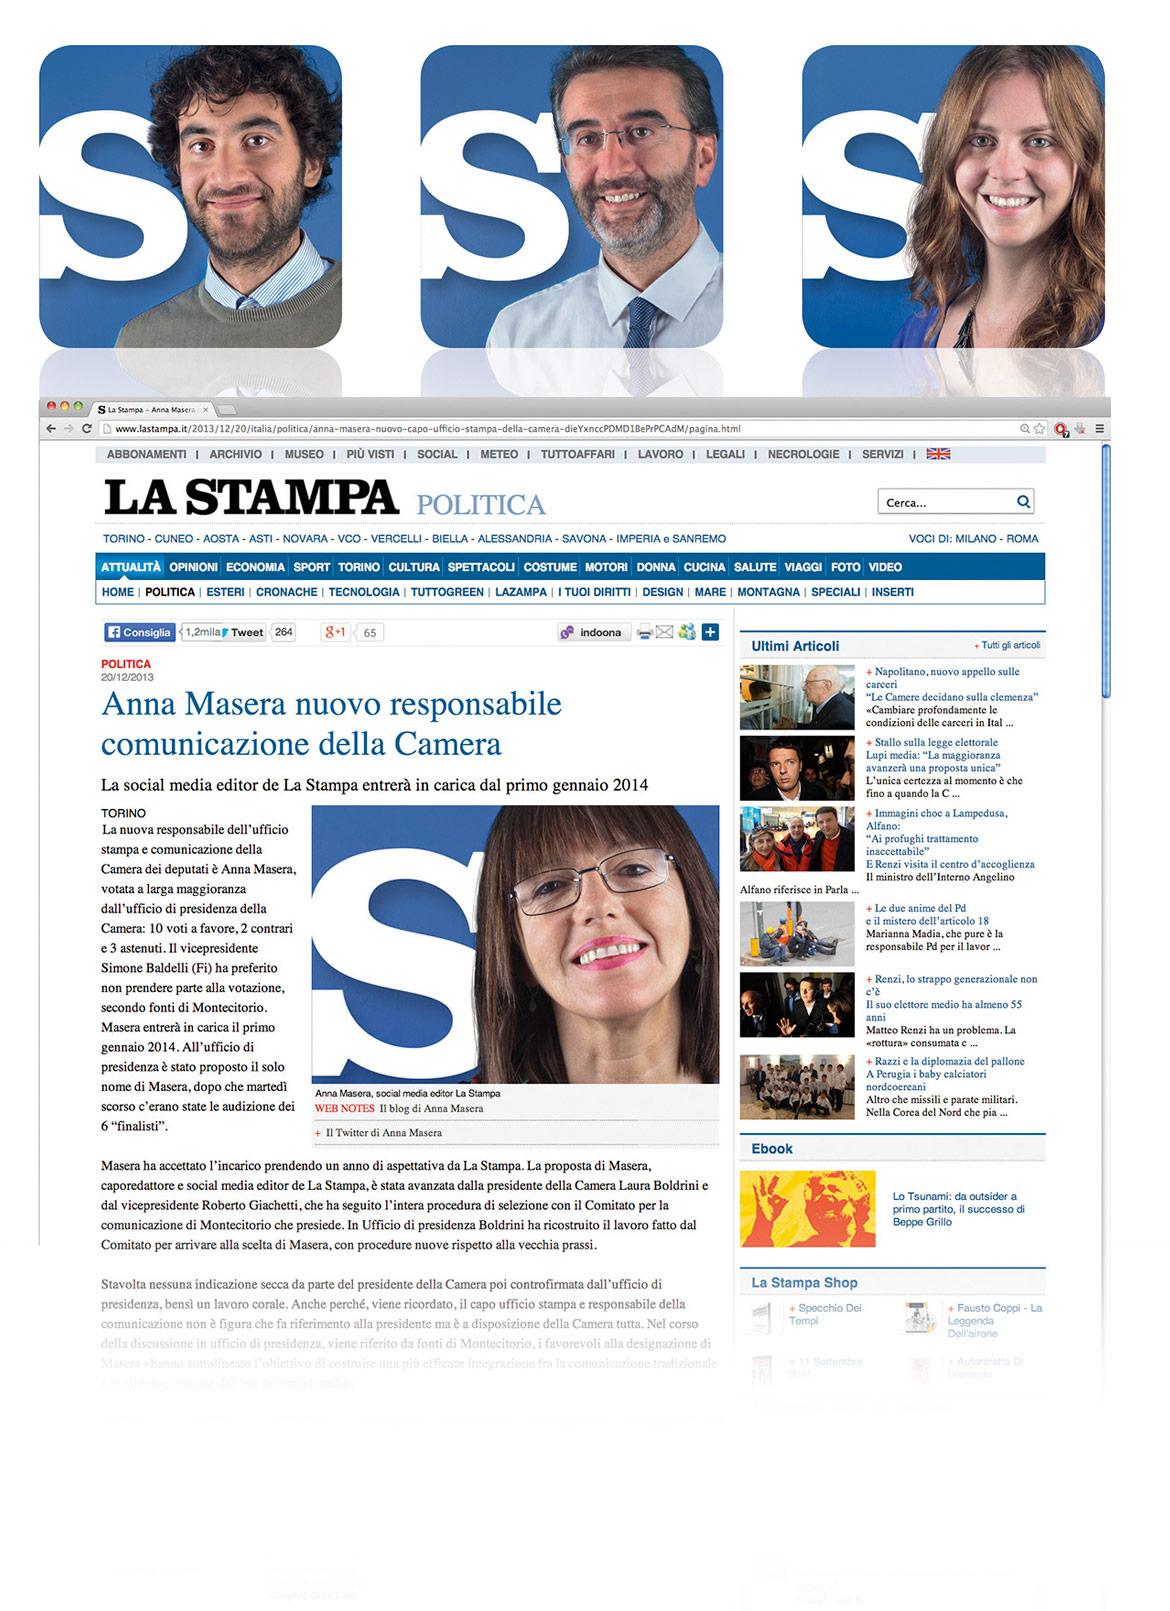 La Stampa social identity-0